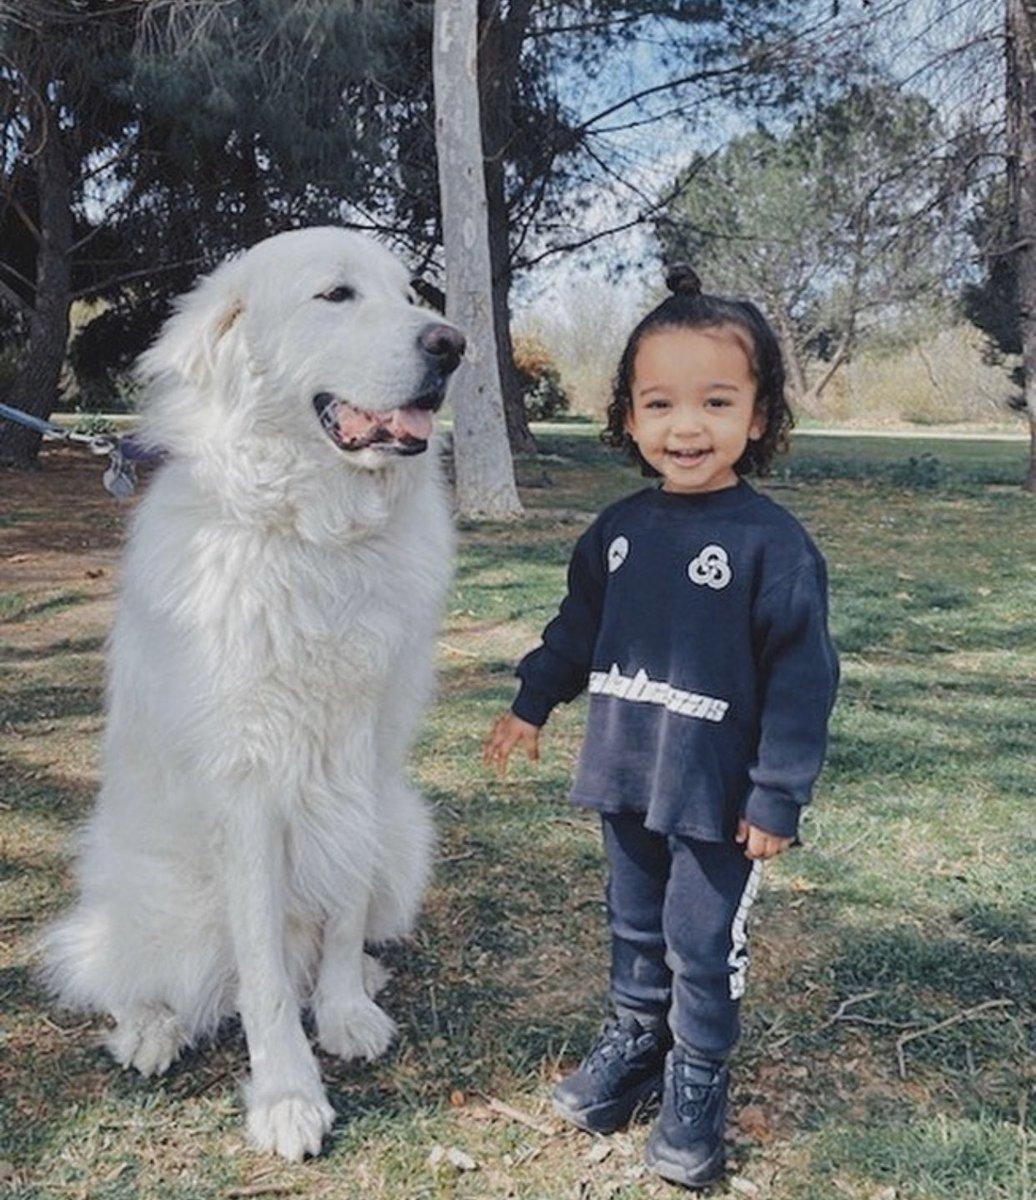 My Chi girl loves doggies!!! https://t.co/GvvtkQAO9w